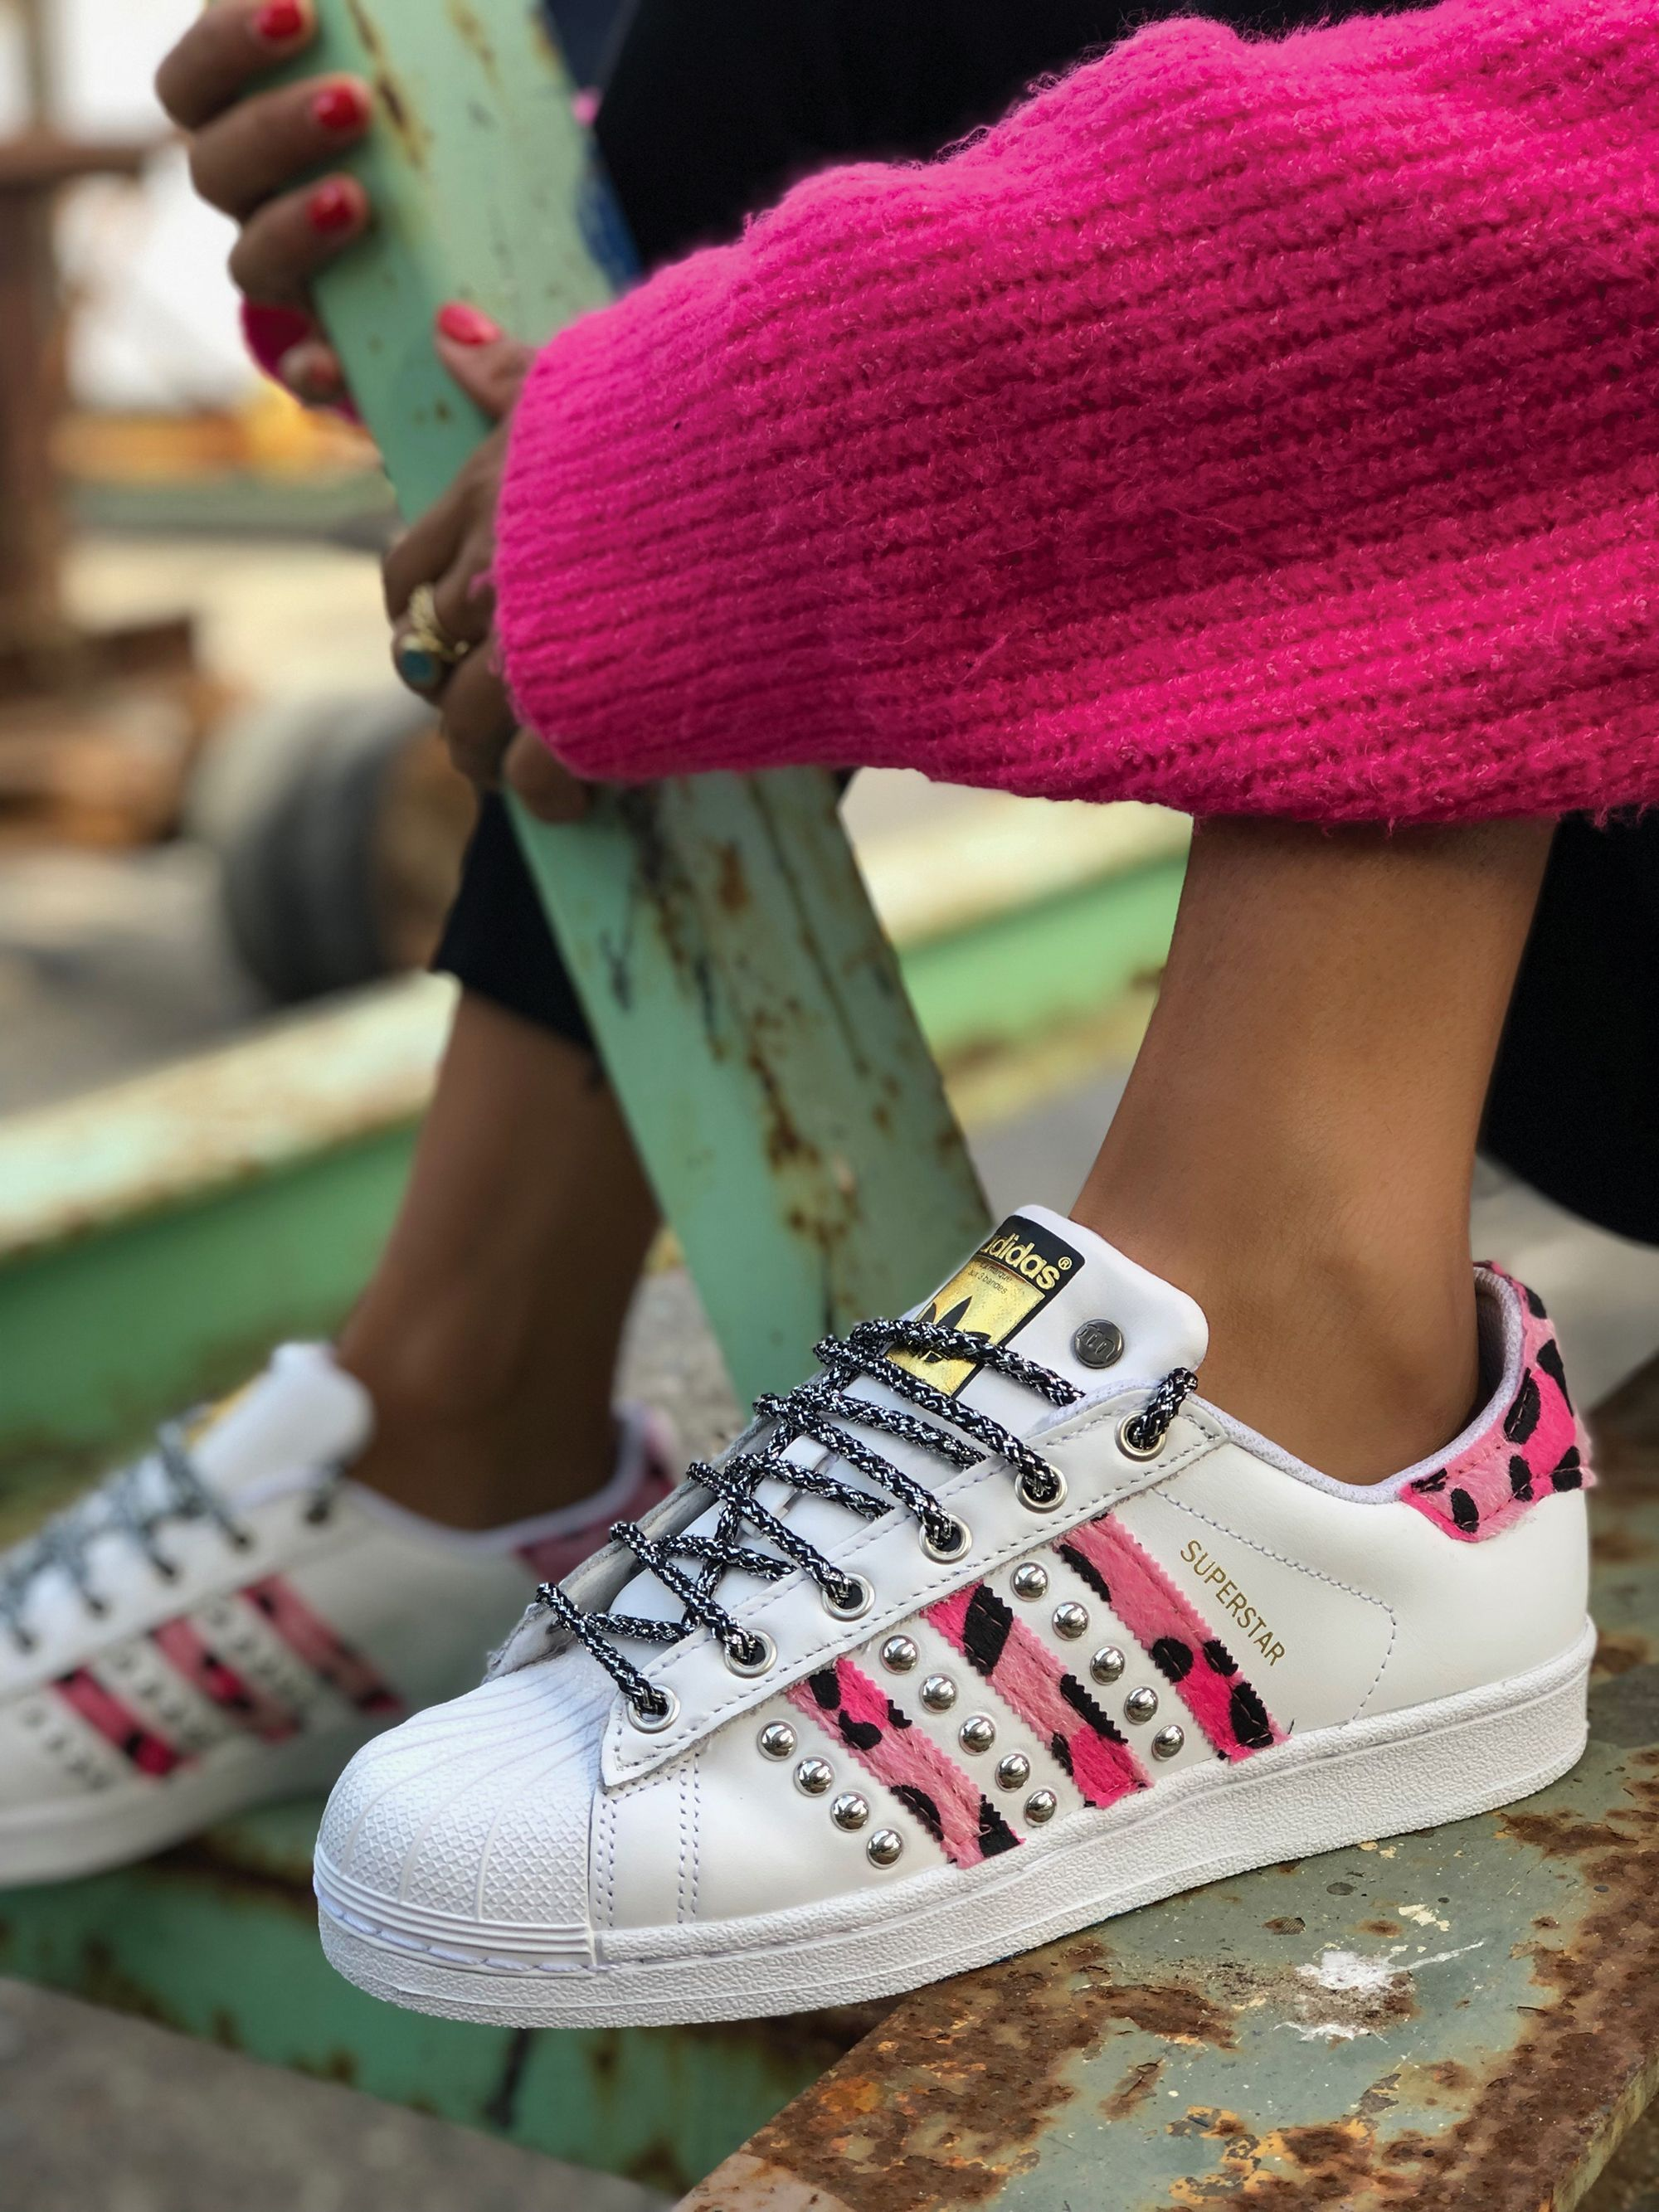 scarpe adidas donna bianche con strass